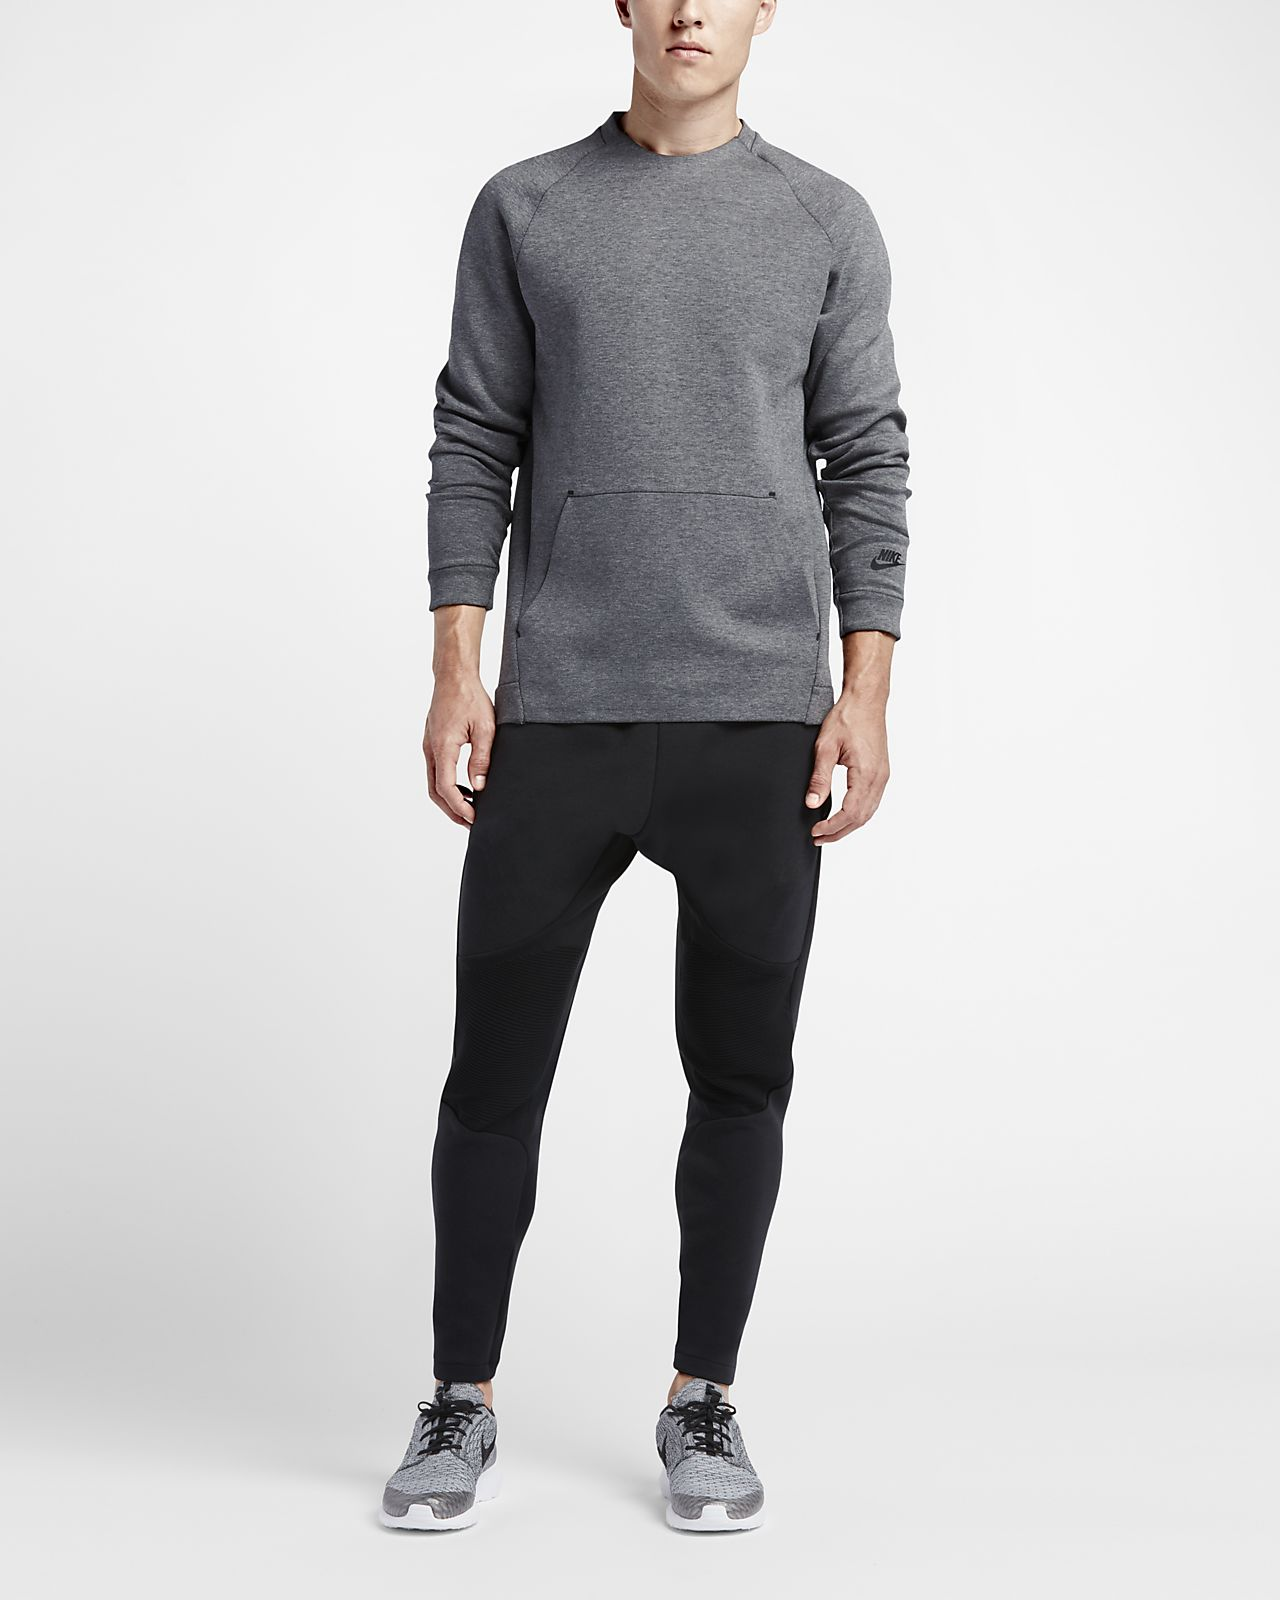 Homme Nike Crew Shirt Sweat Sportswear Tech Fleece Pour qSUzMVp